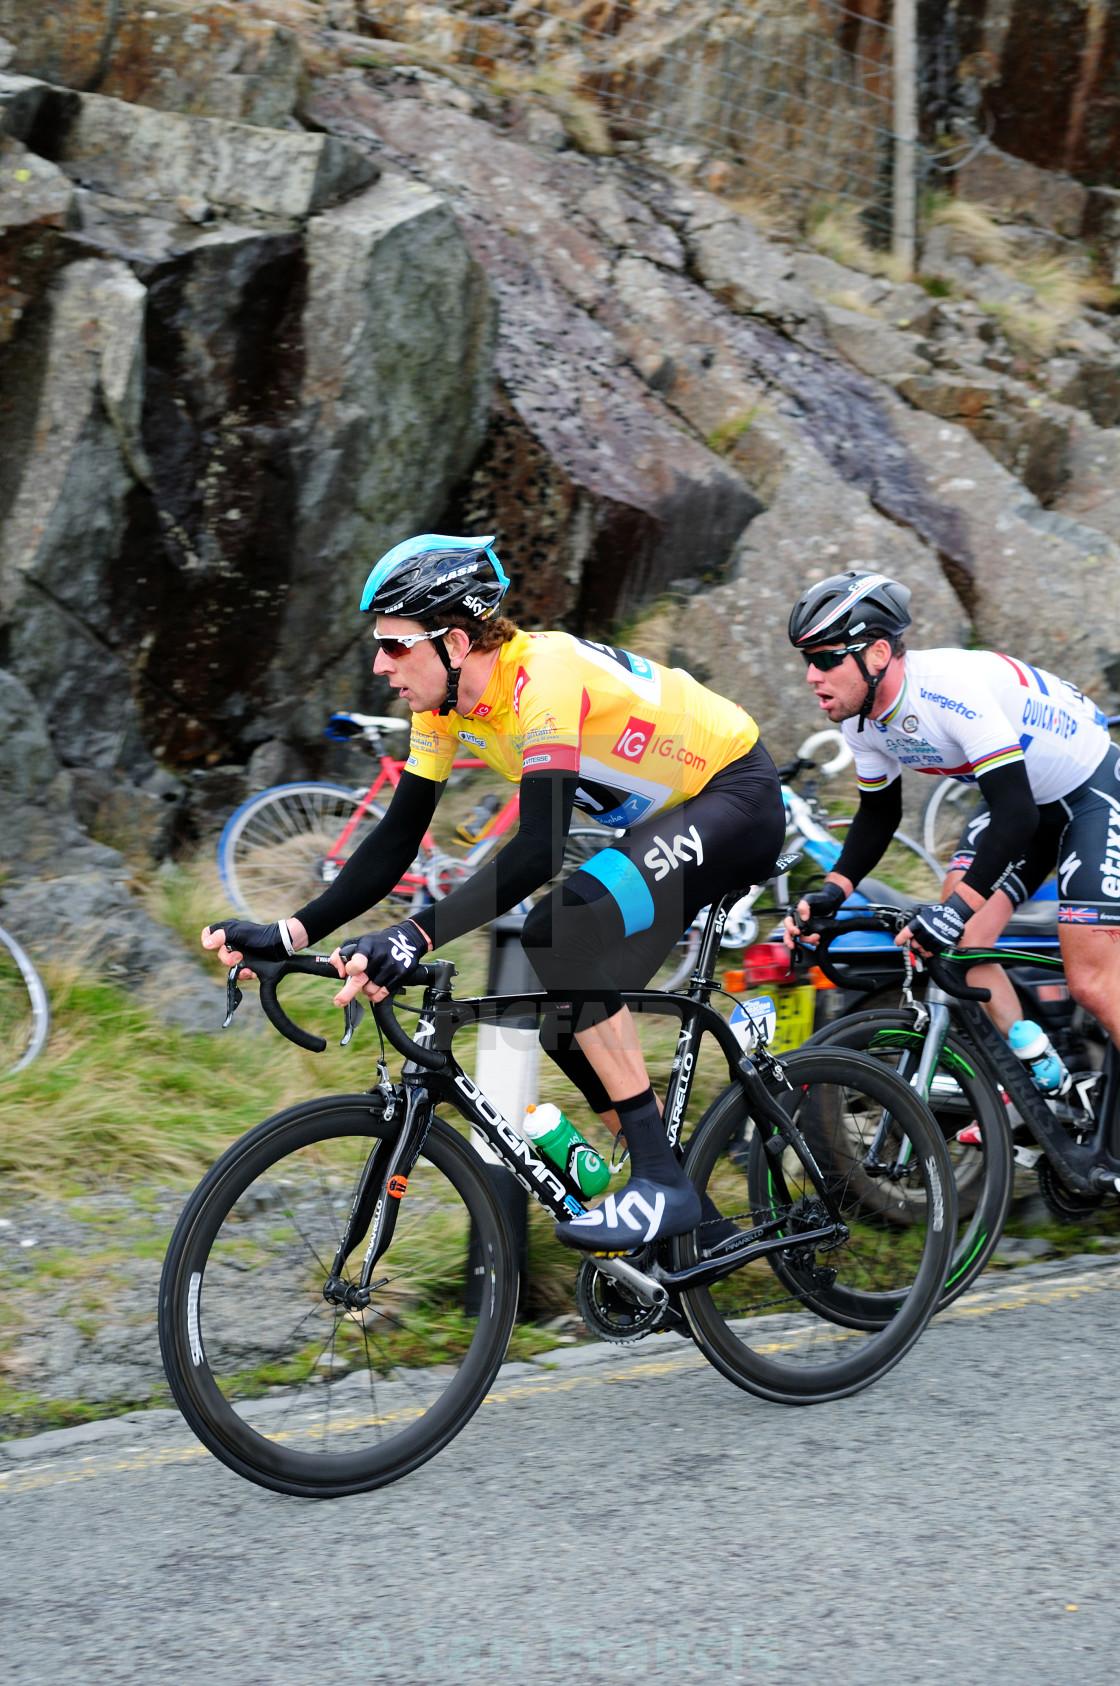 """Tour of Britain ,Stage 4 -Stoke-On-Trent to Llanberis(Pen-Y-Pas)."" stock image"